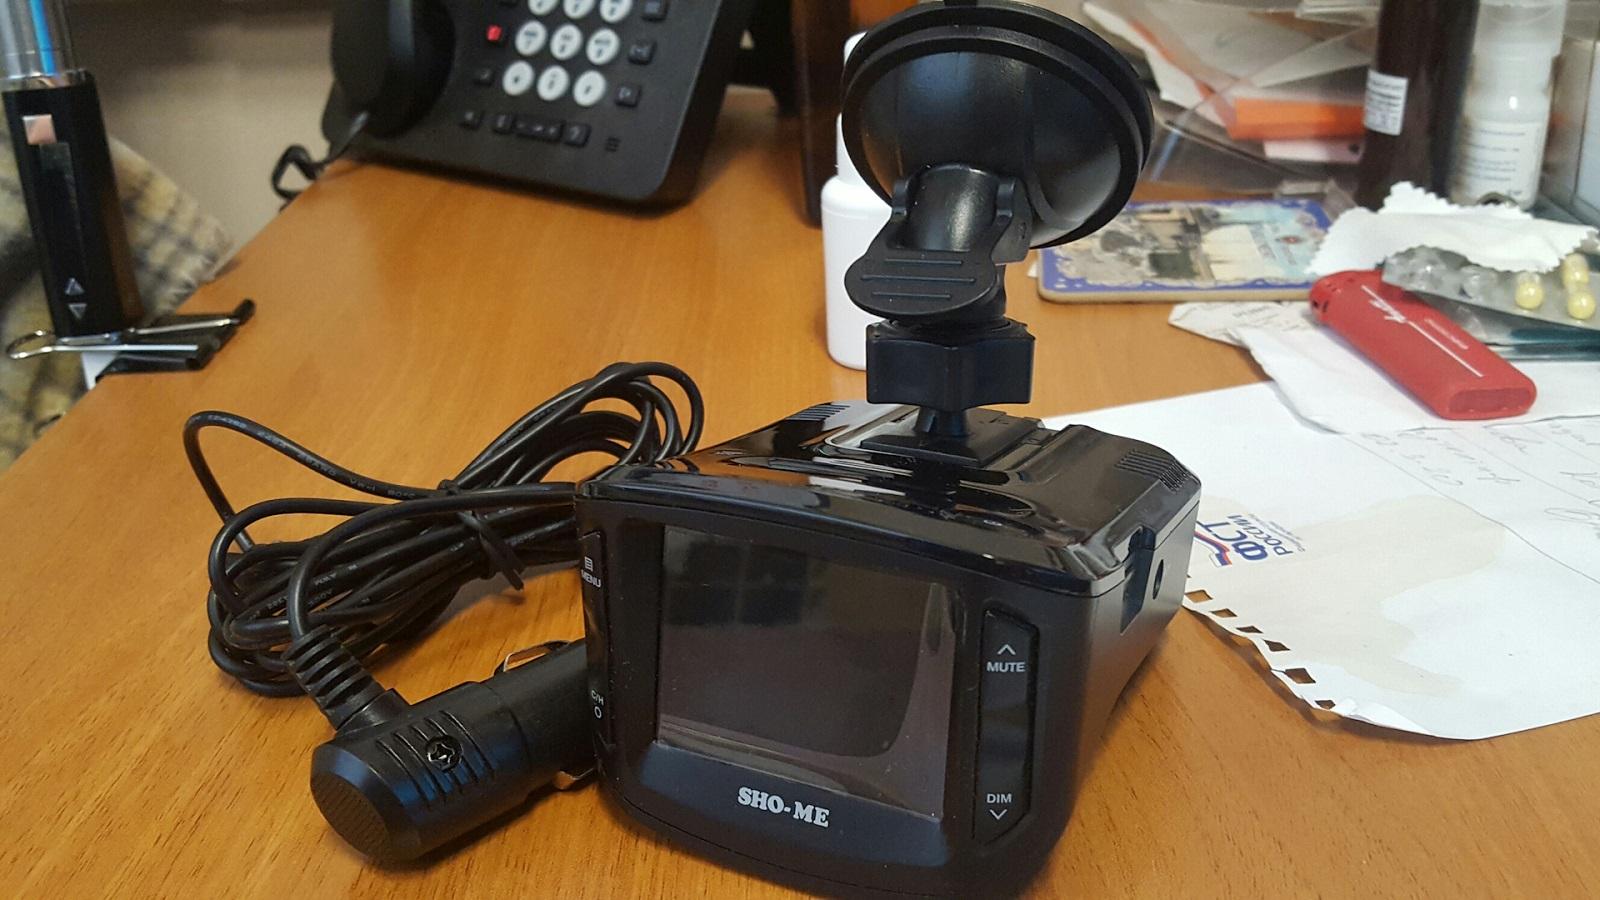 Видеорегистратор с детектором Daocam Combo wifi 2ch